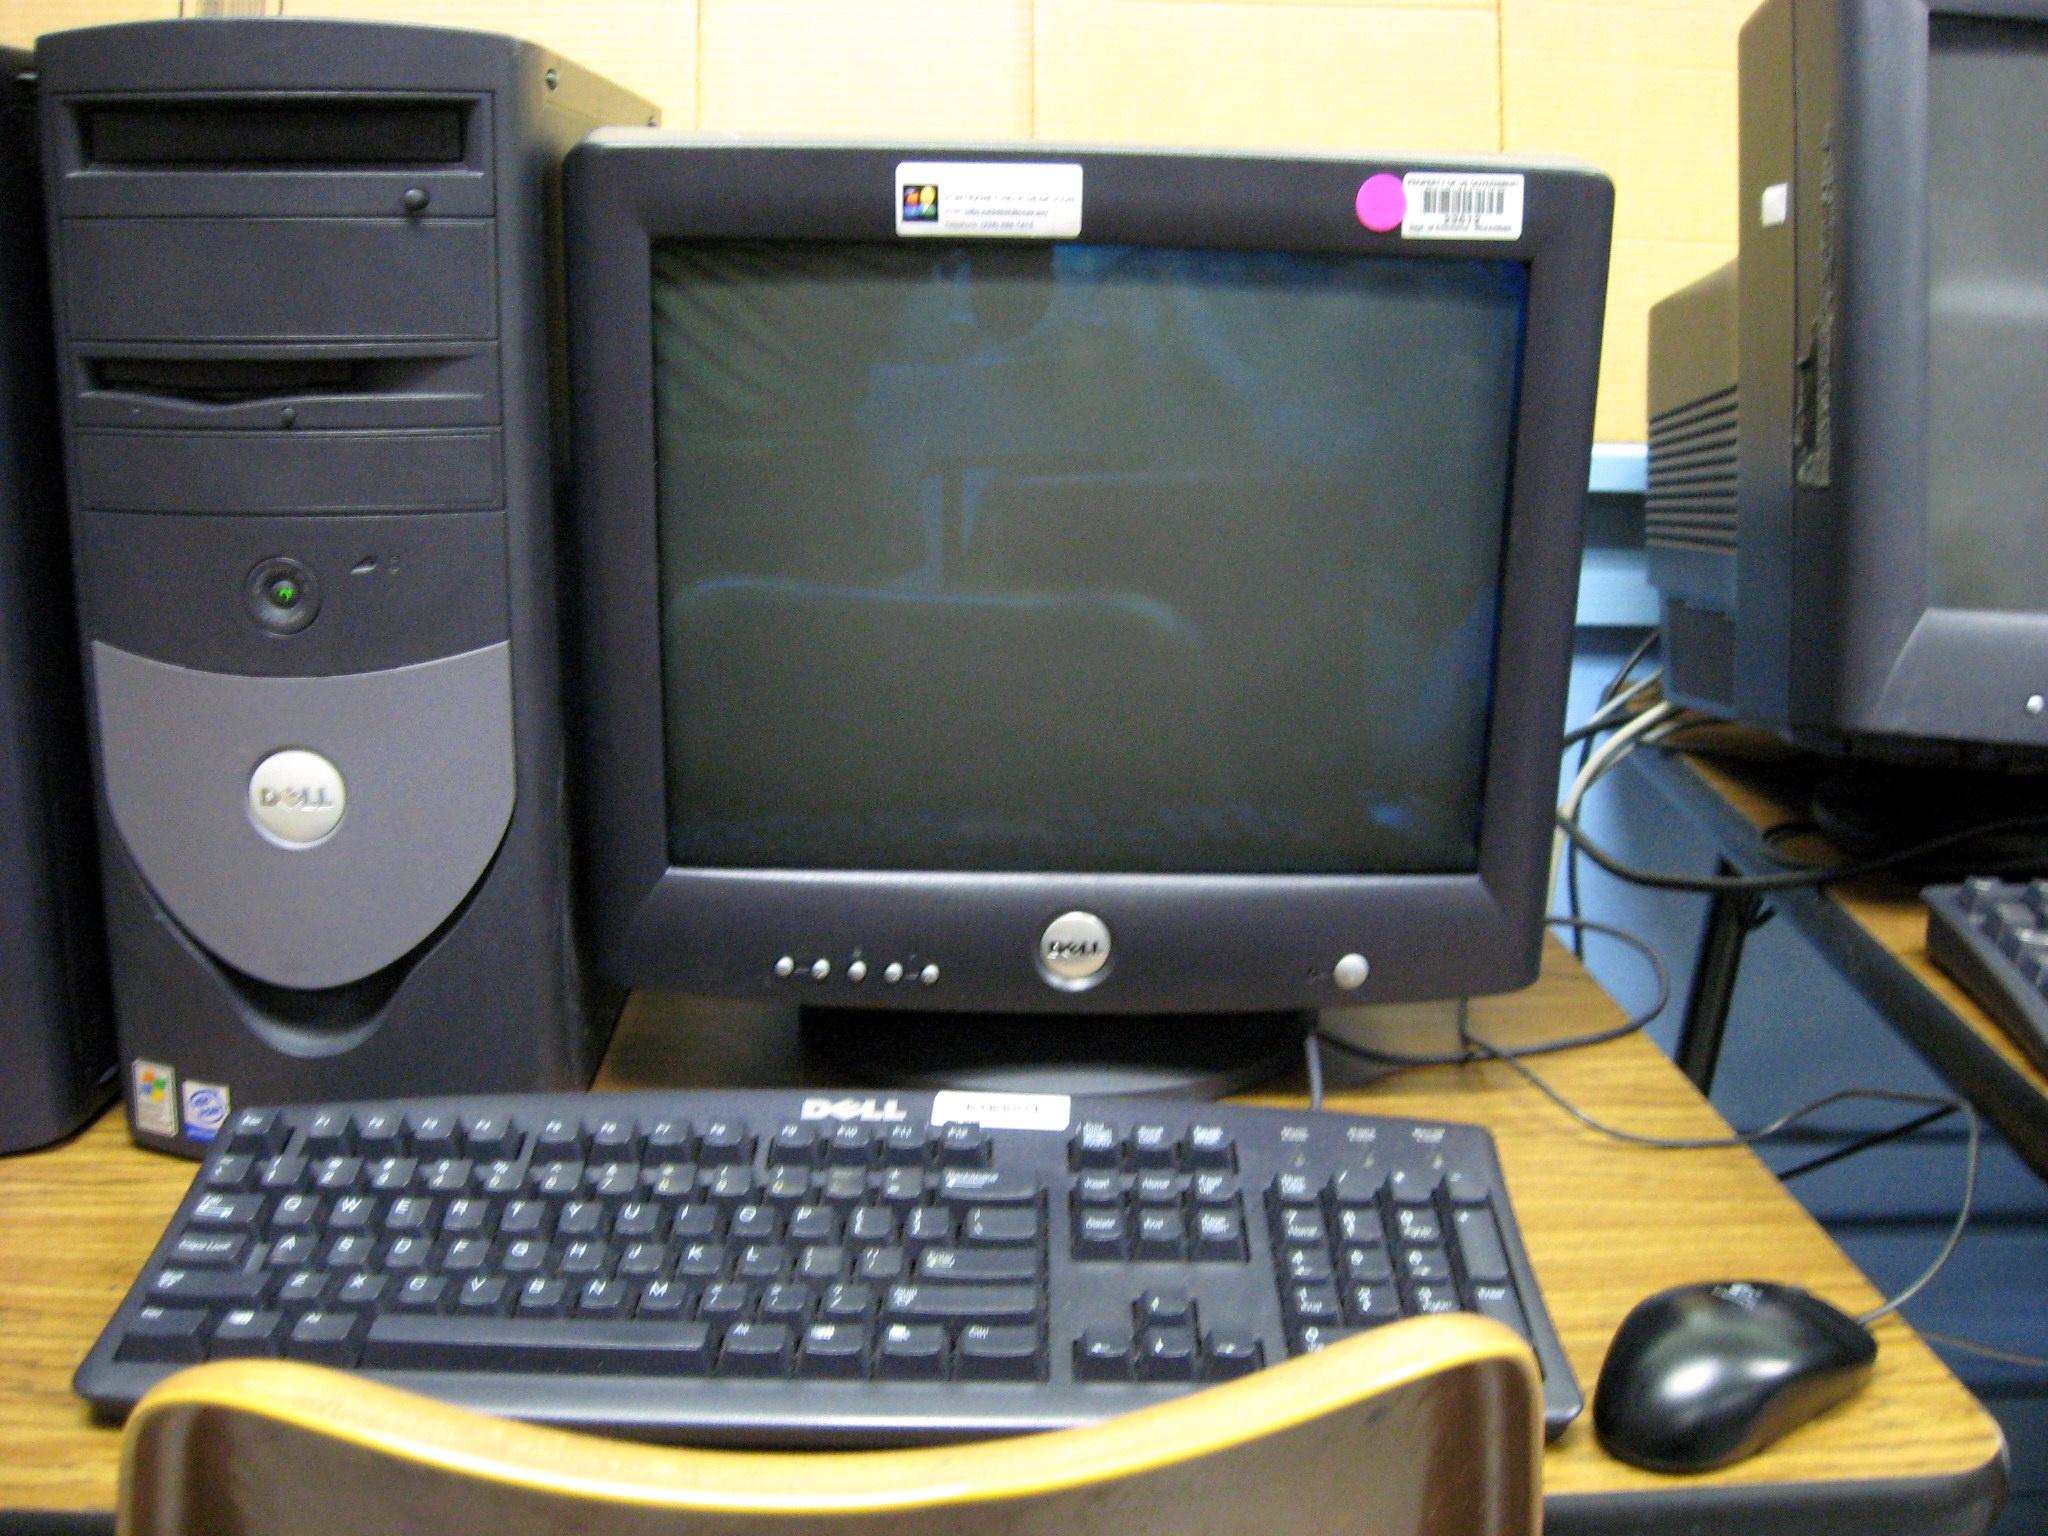 File:Dell Desktop Computer in school classroom.jpg ...